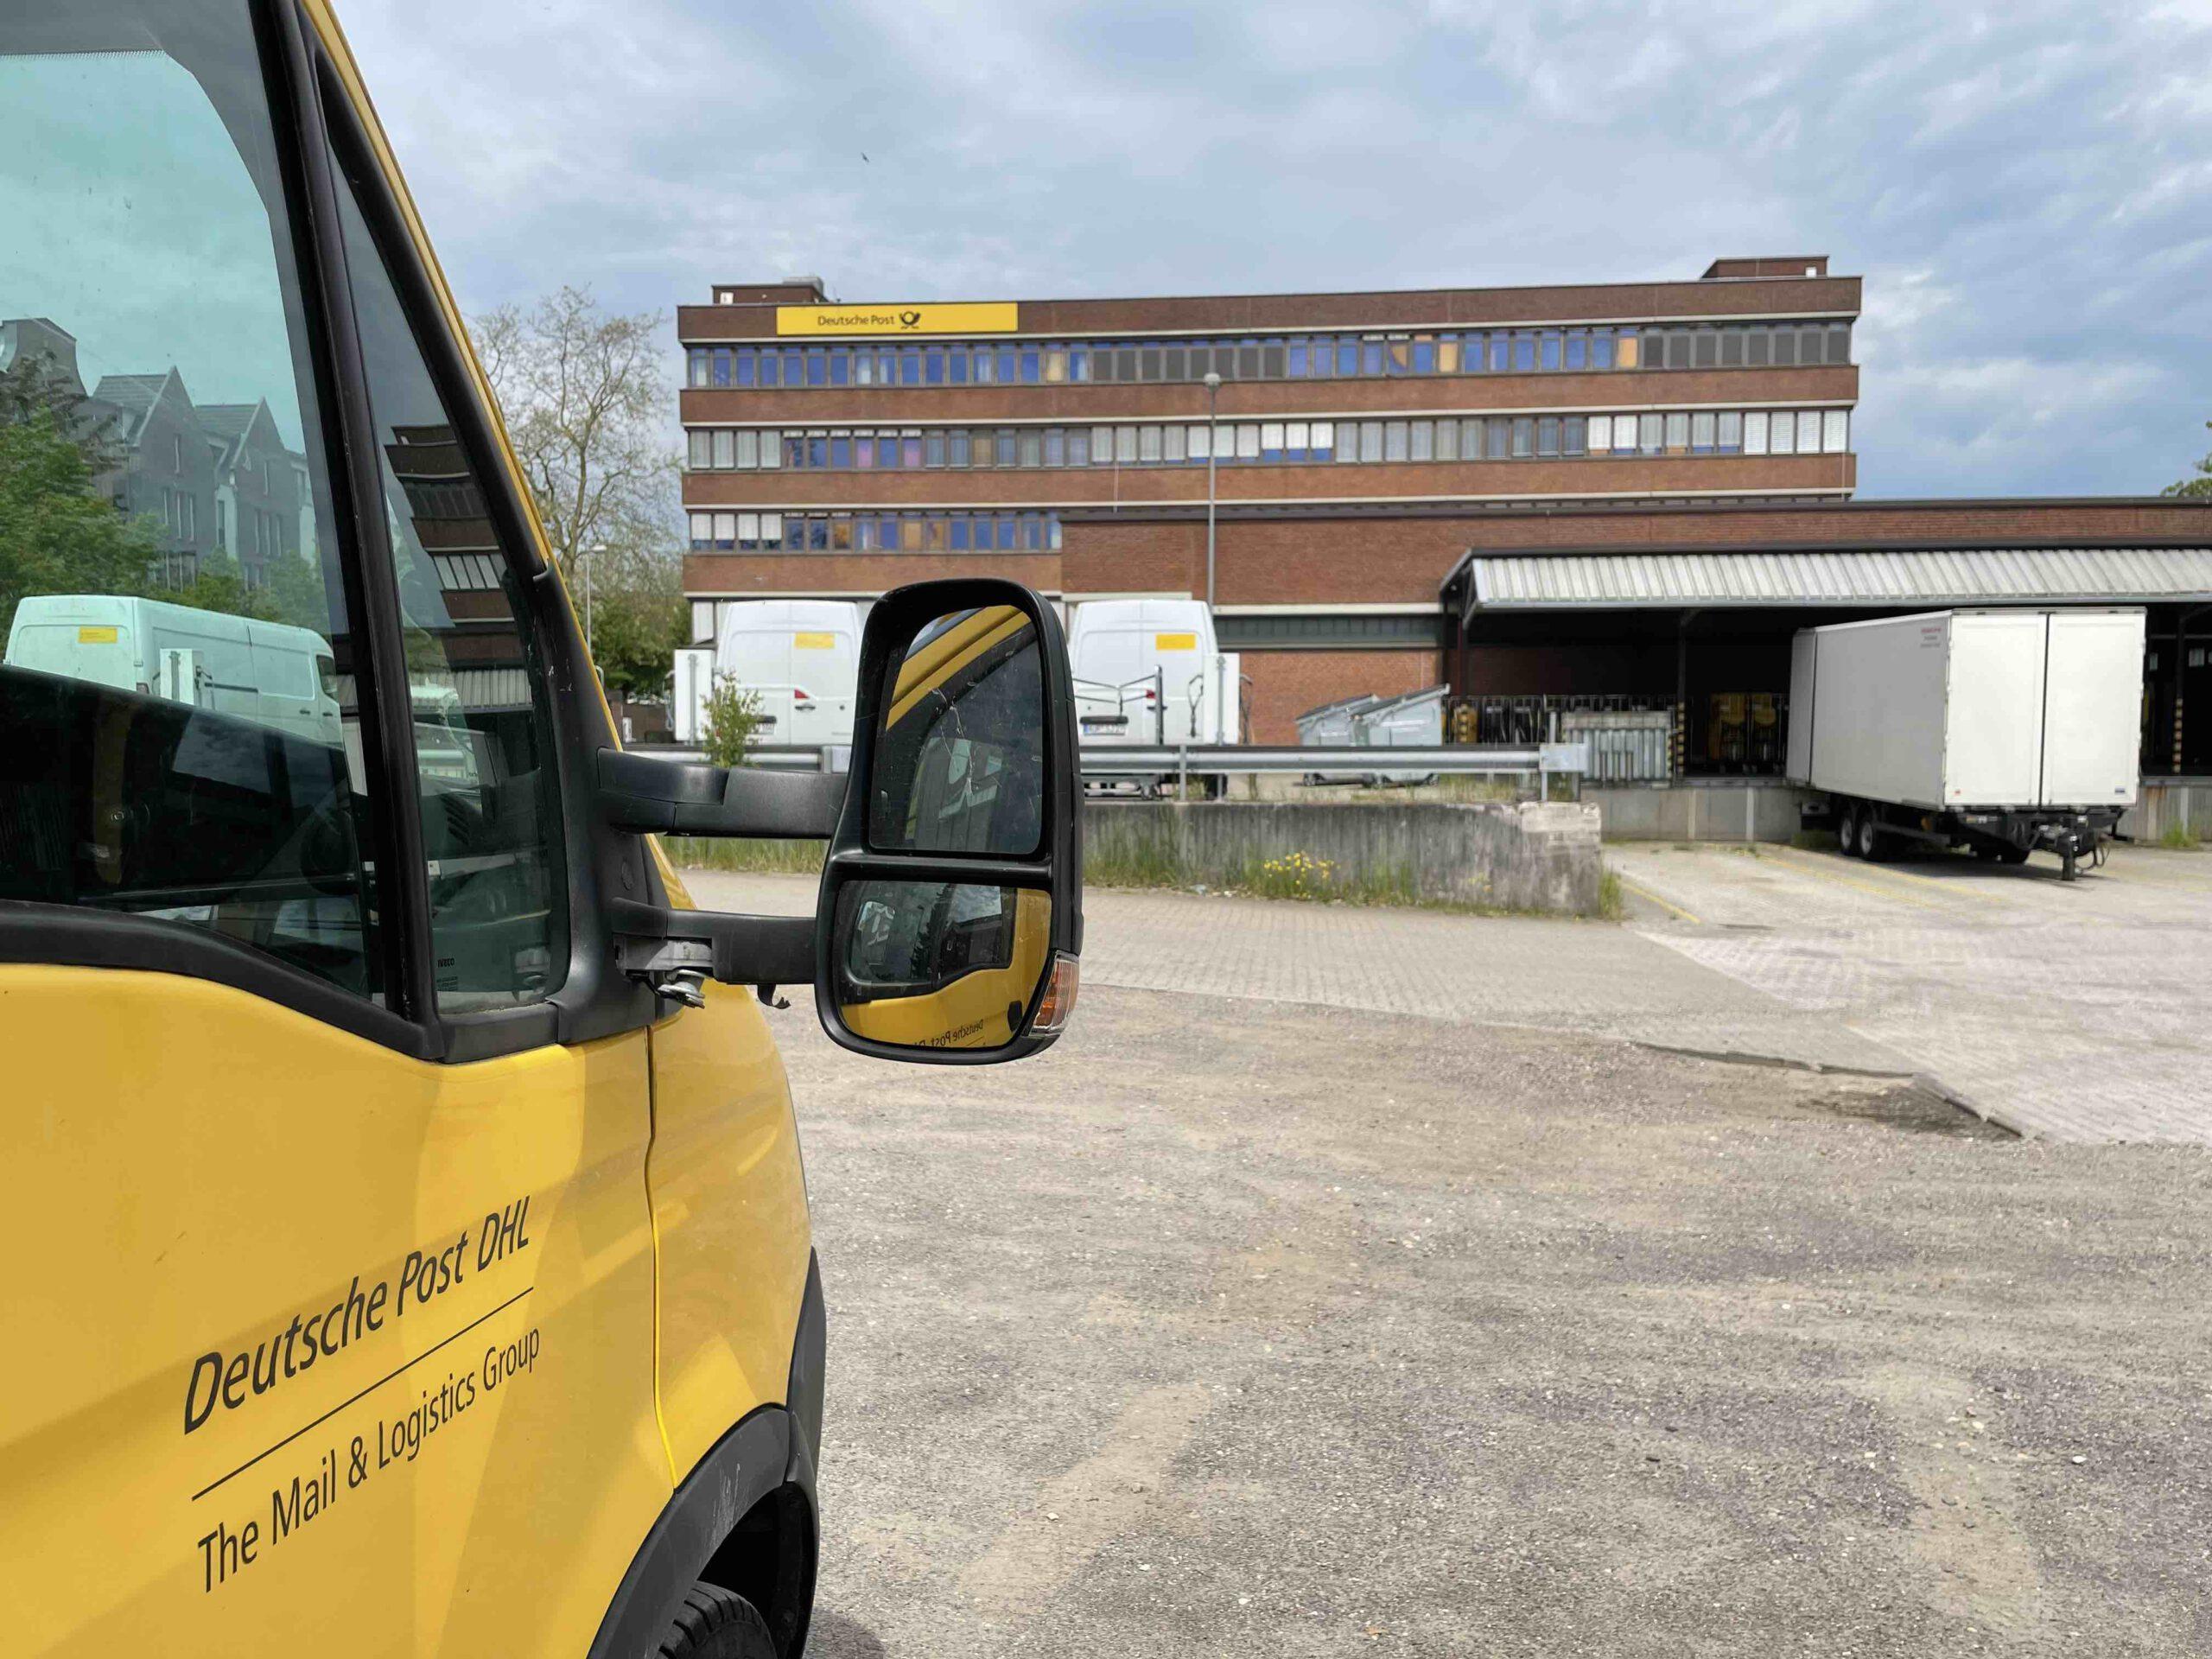 Post-Areal in Leer: Noch keine konkreten Pläne